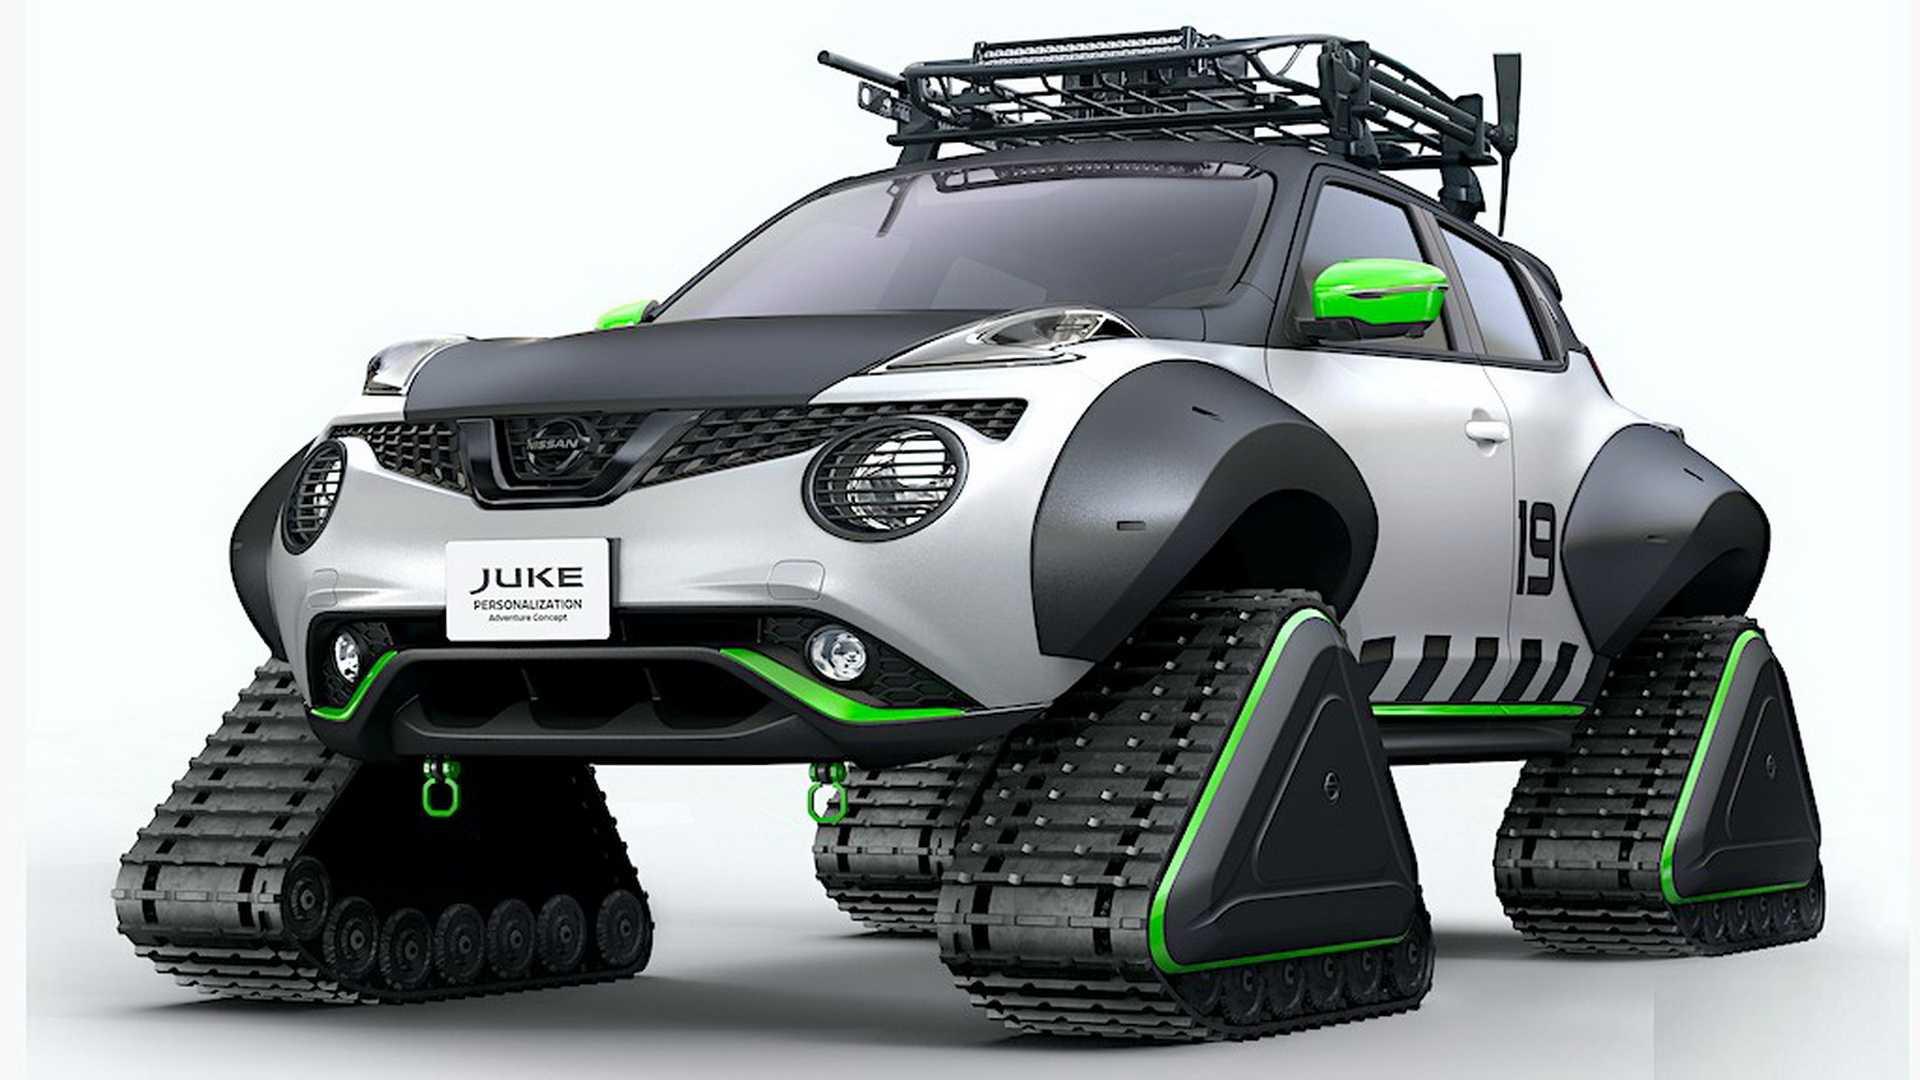 nissan-juke-personalization-adventure-concept